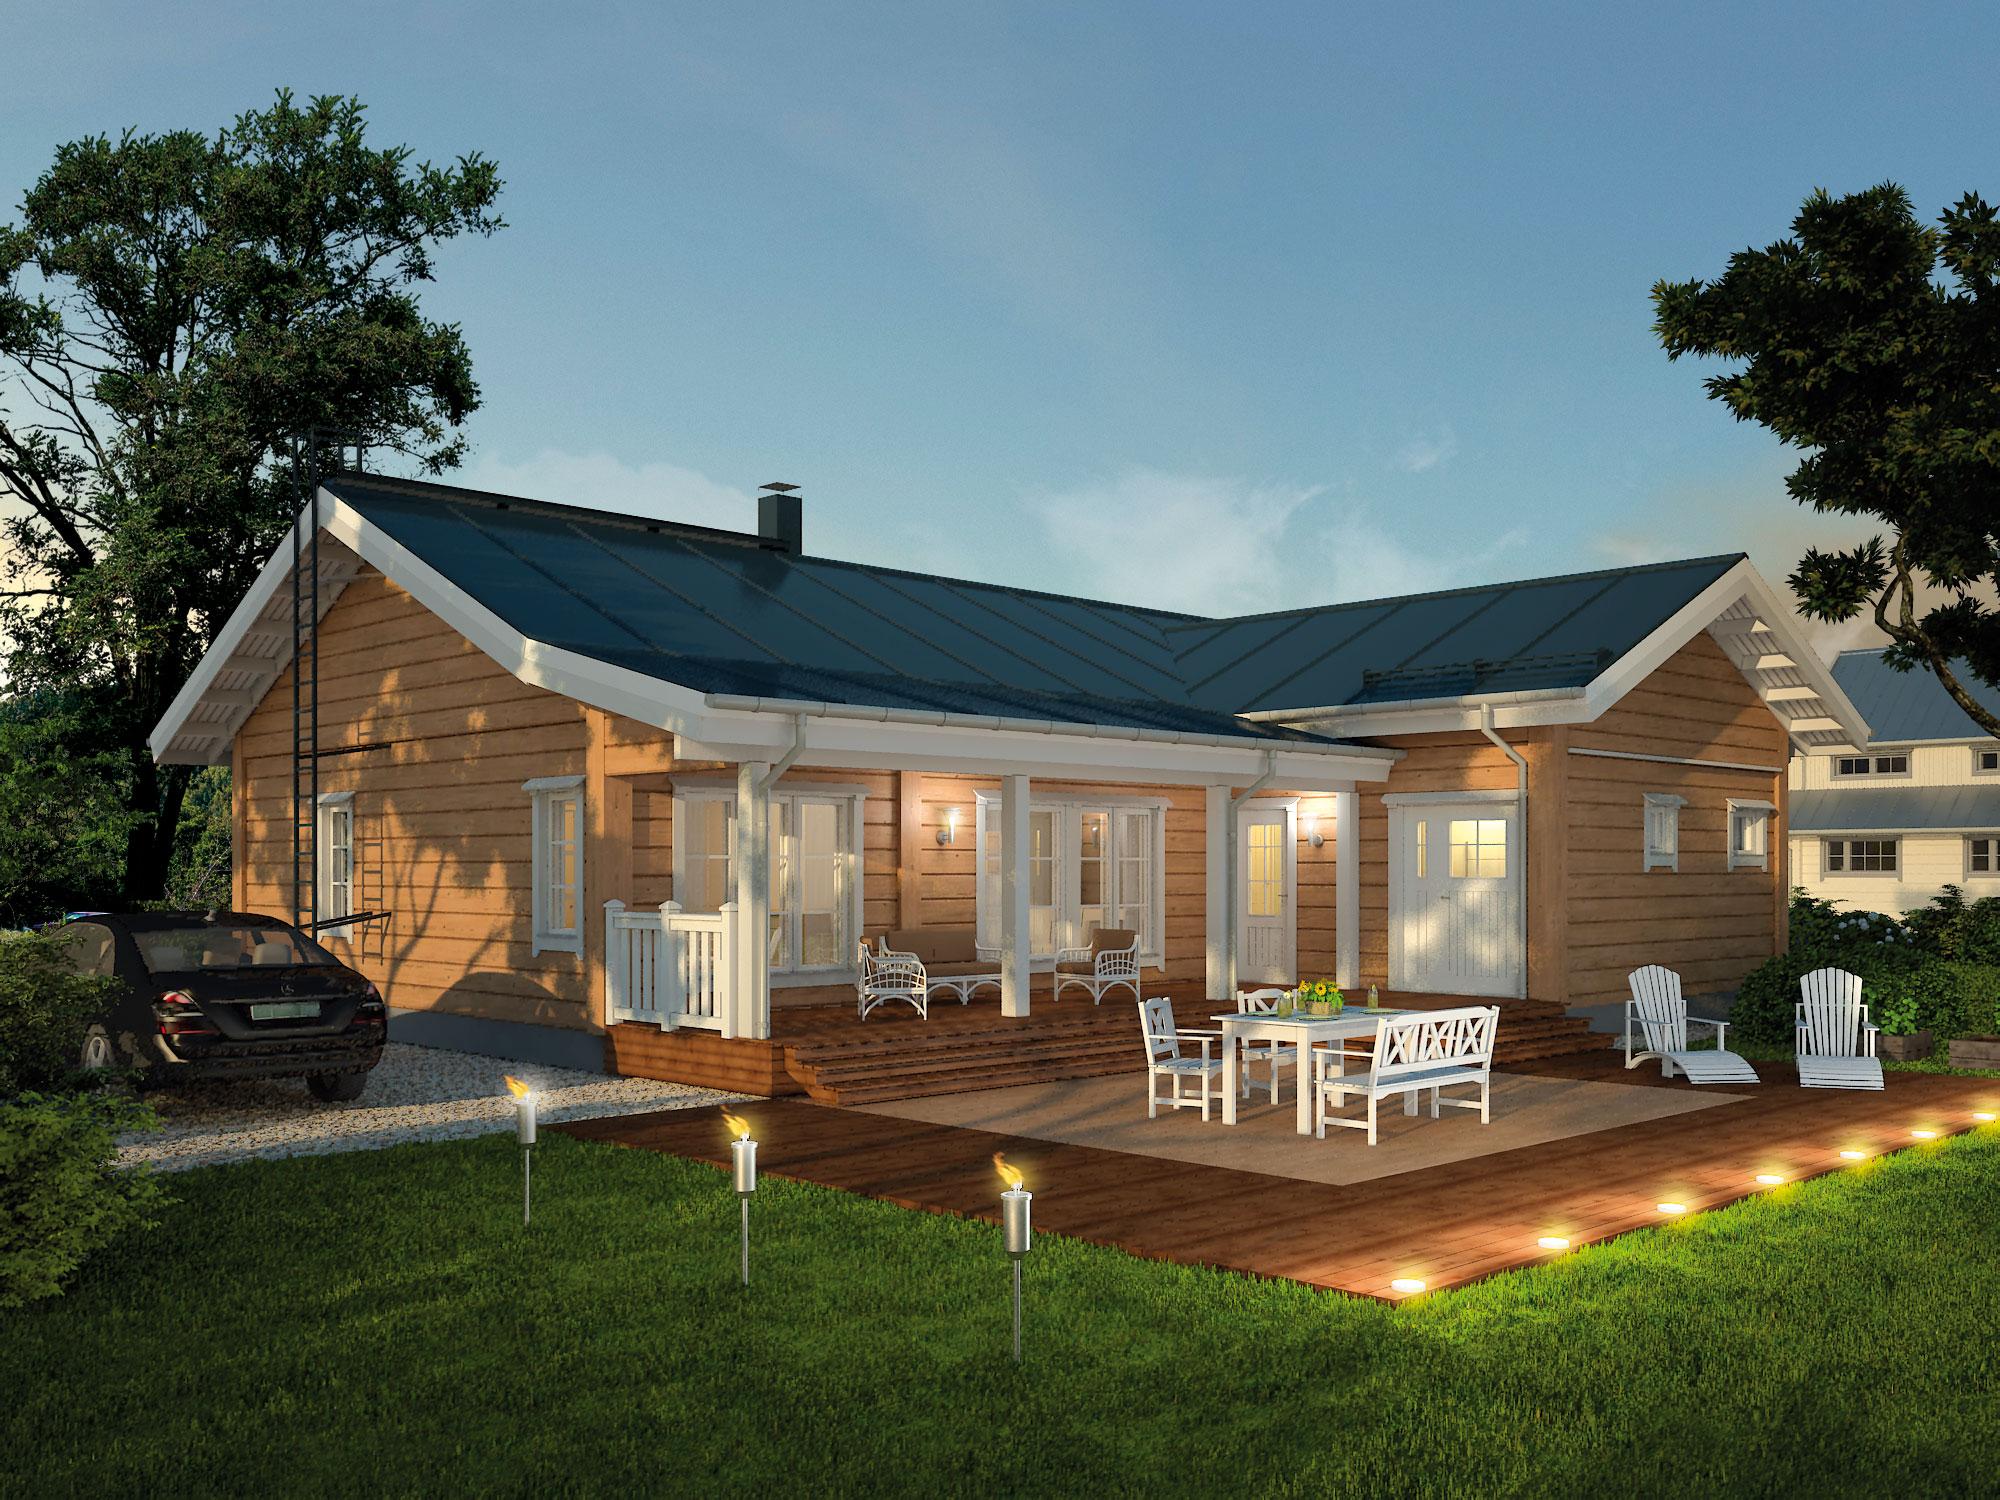 http://www.homemodern.co/tiny-modern-home/17/modern-modular-prefab-homes-prices/